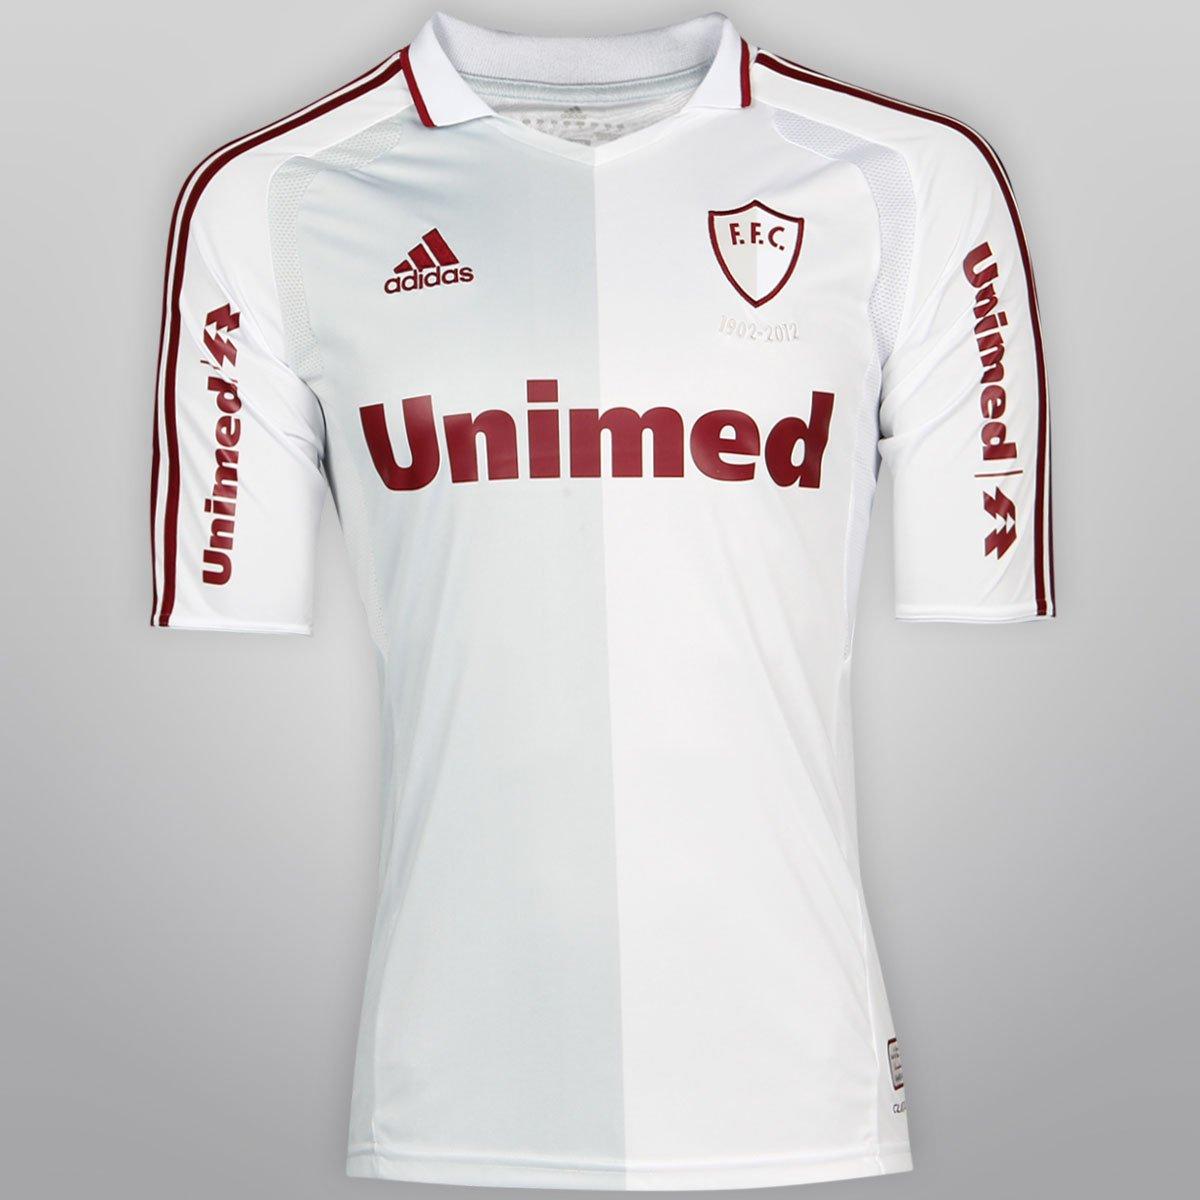 Camisa Adidas Fluminense 12 13 s nº - 110 Anos - Ed. Limitada - Compre  Agora  978573be89653